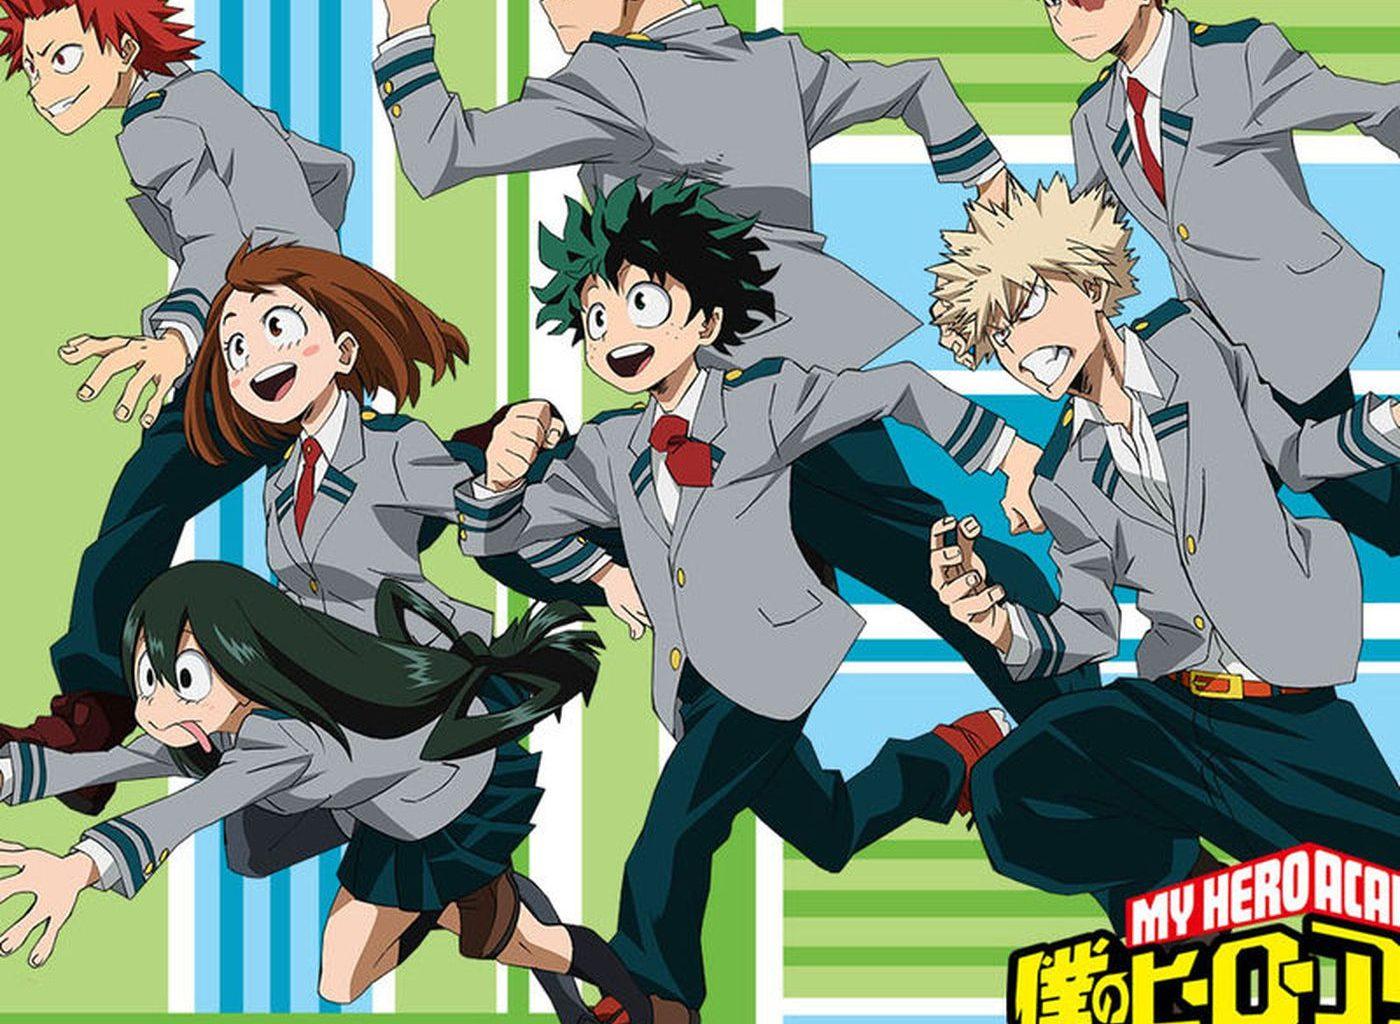 My Hero Academia Season 5 Episode 26 Release Date